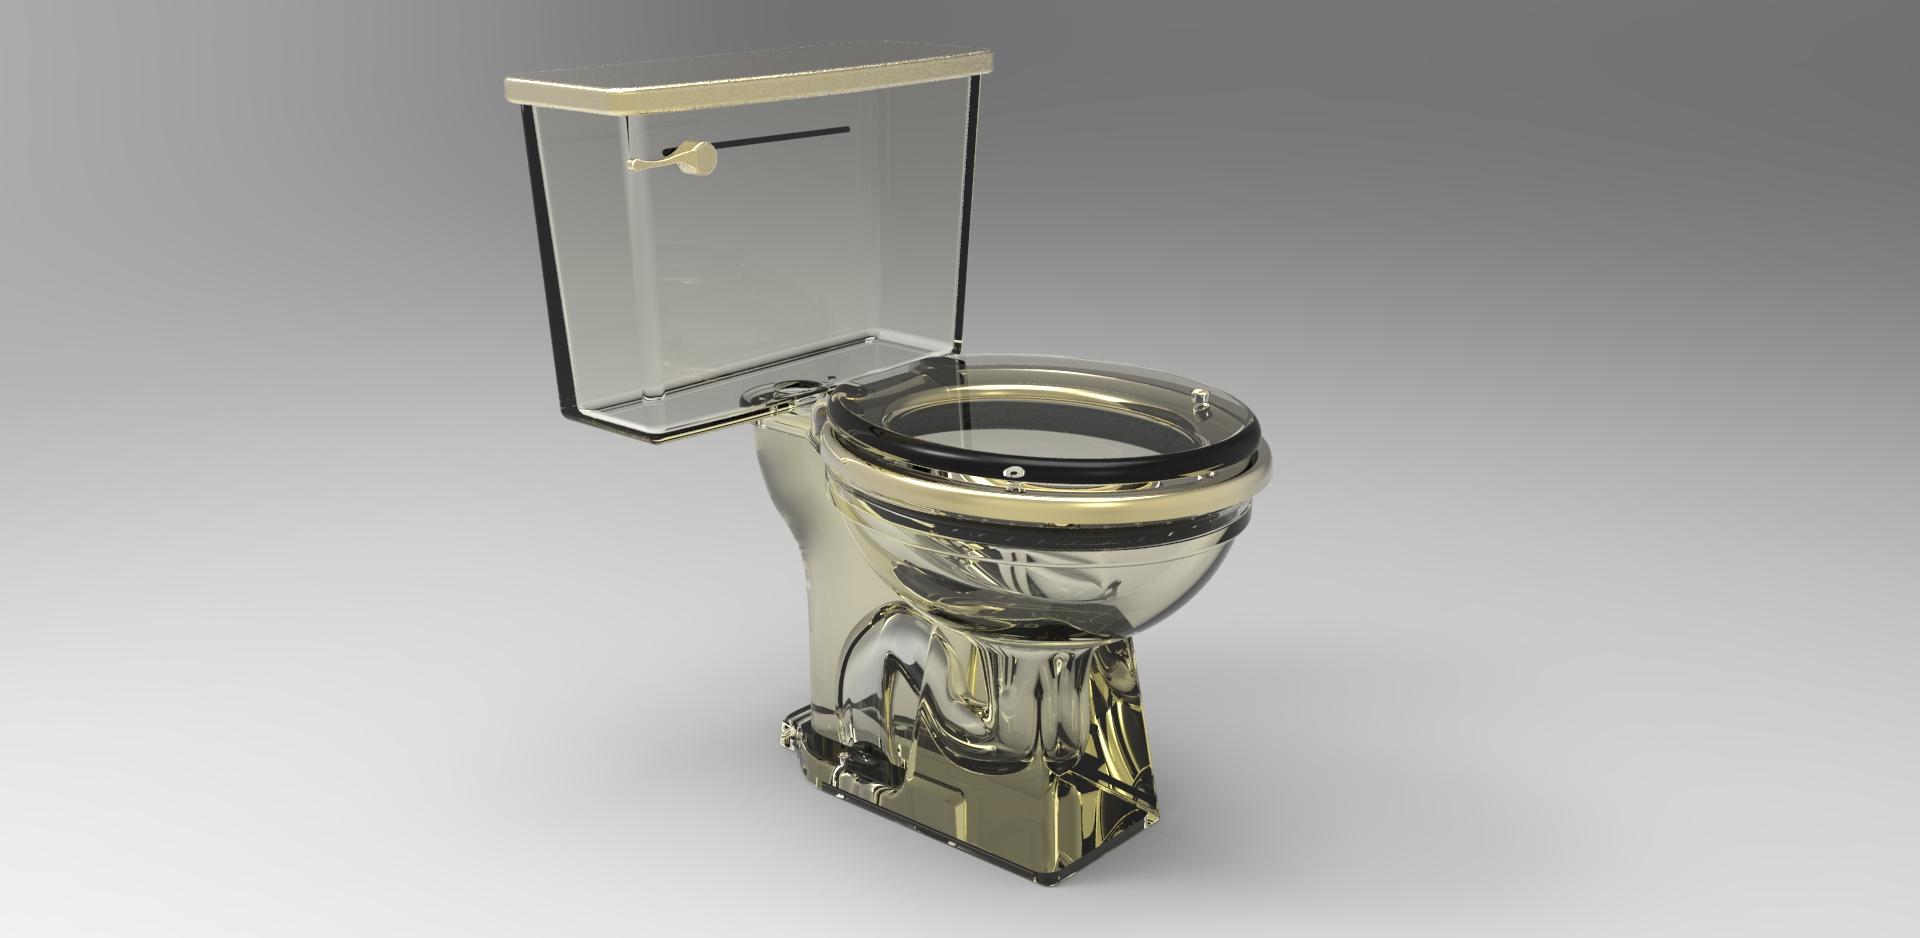 Transparent Toilet Working Model Grabcad Questions